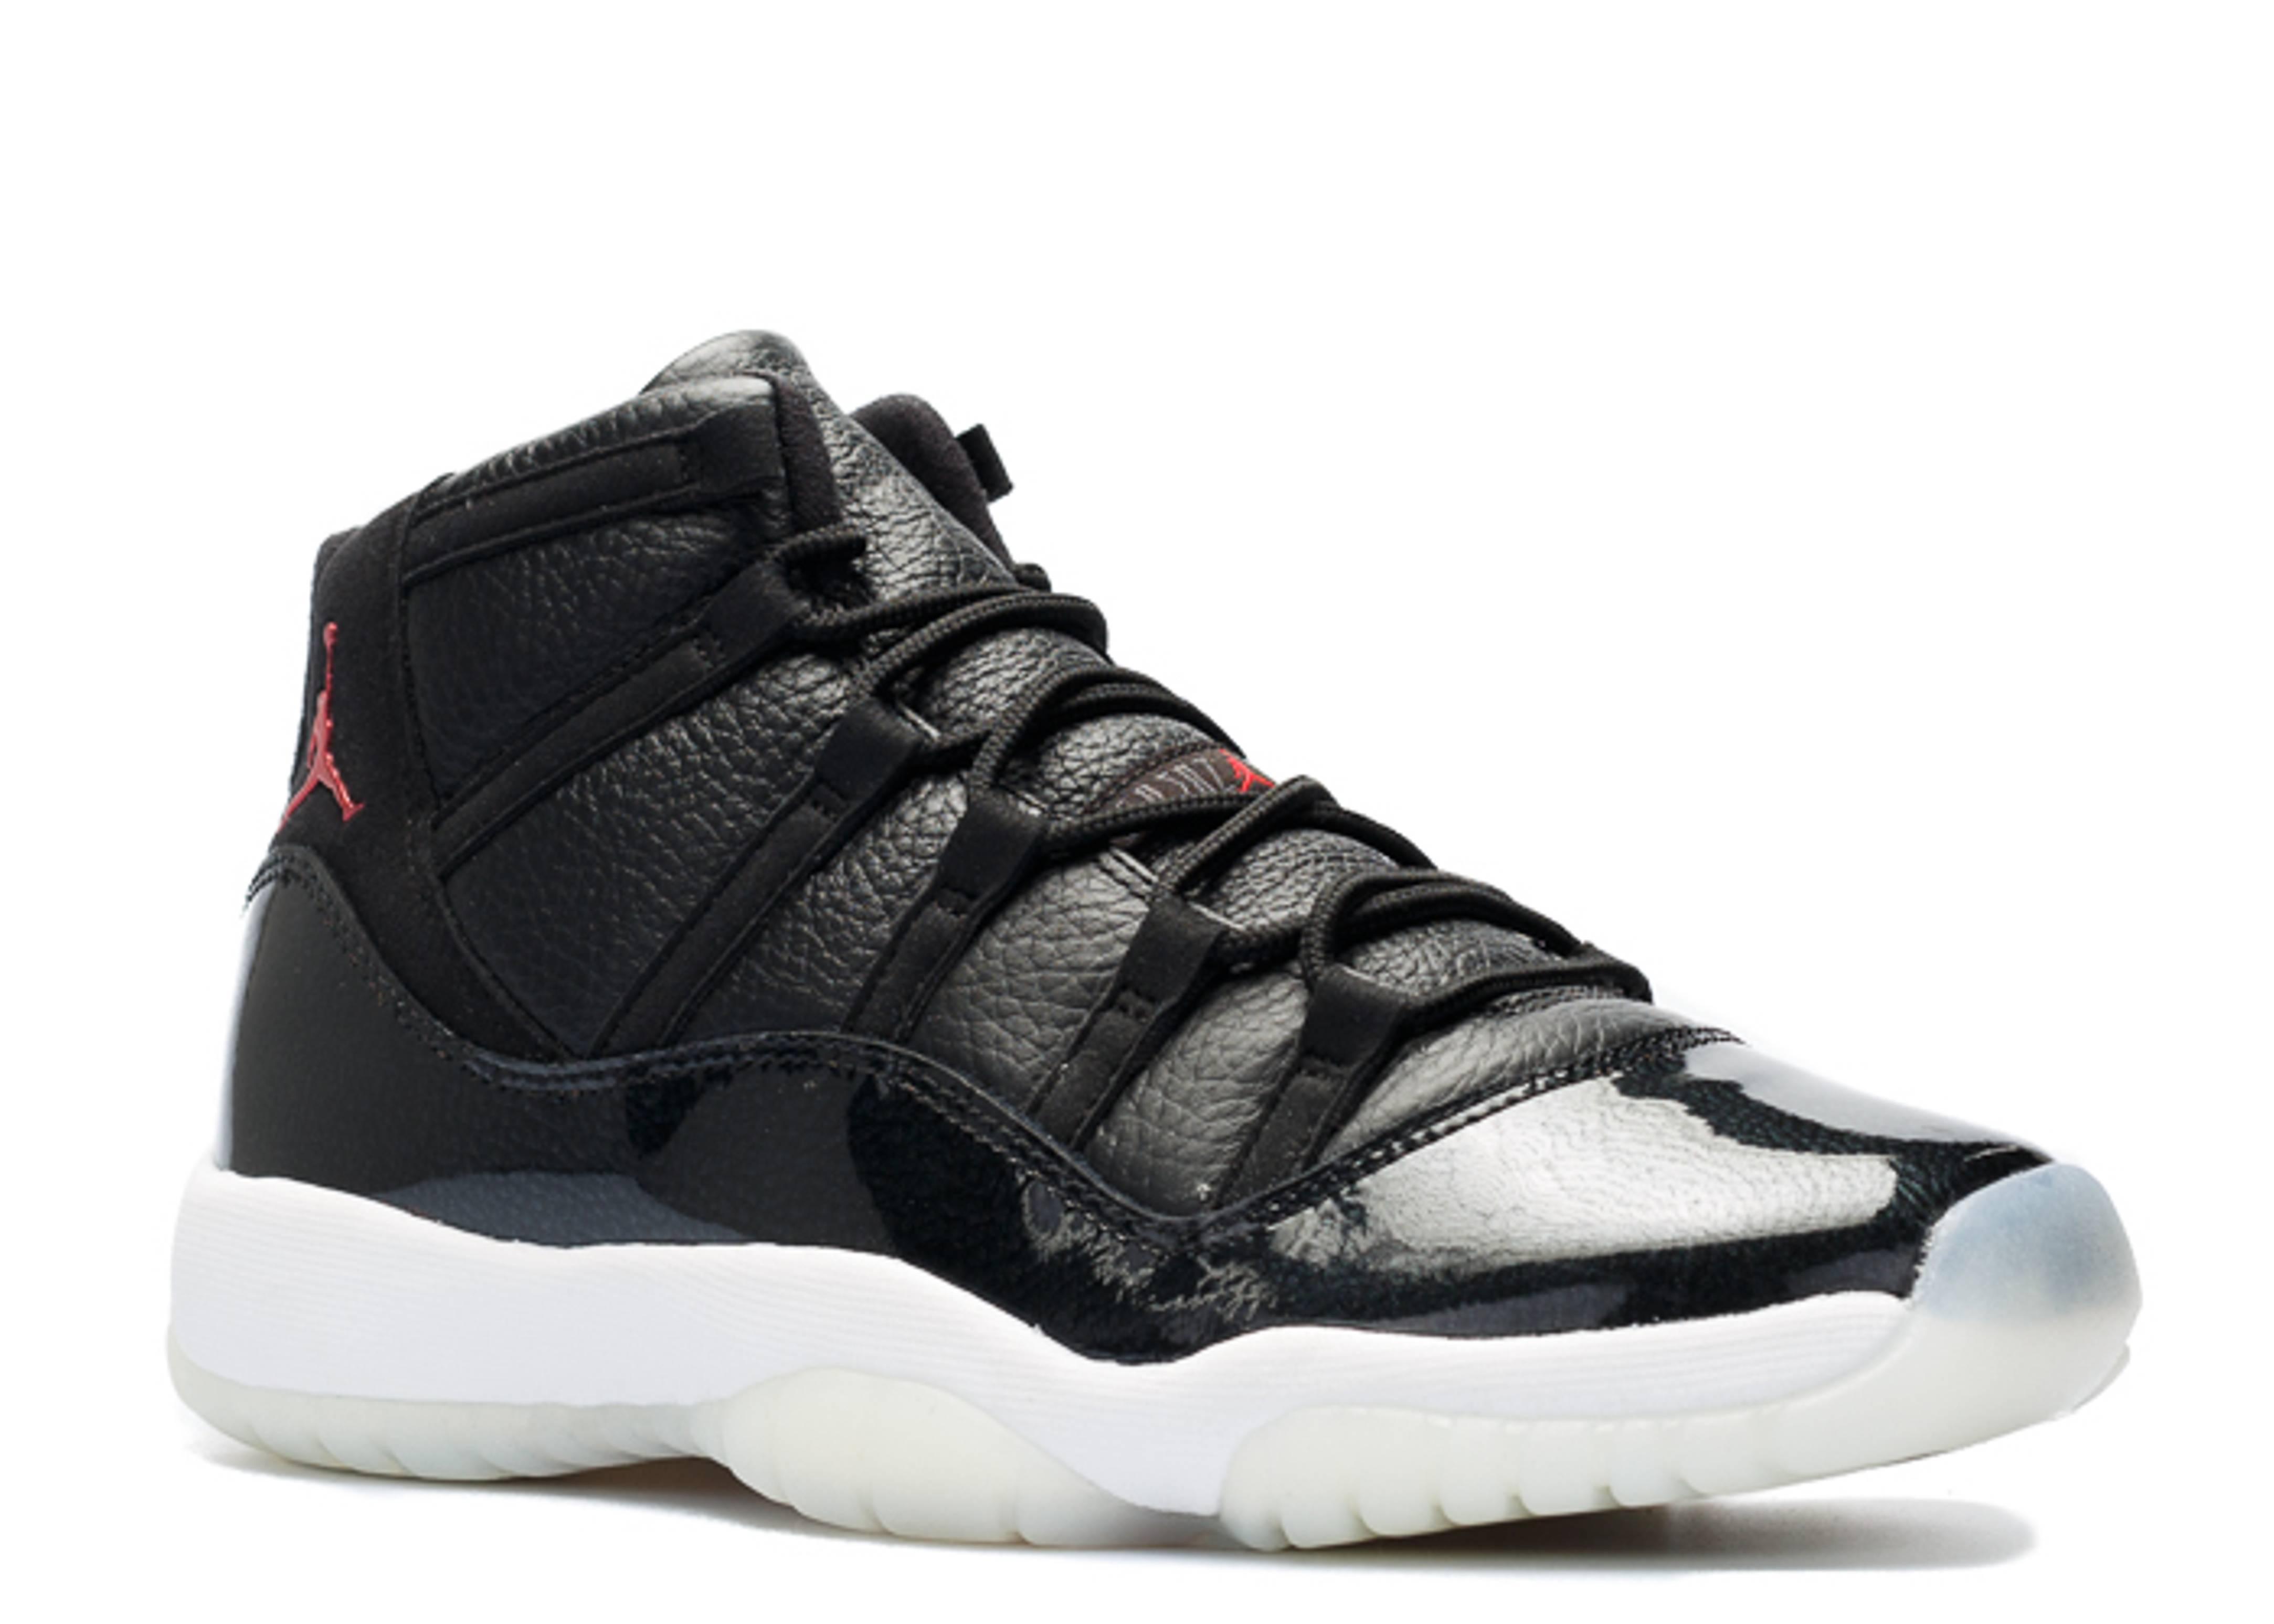 Jordan 11 Retro Bg